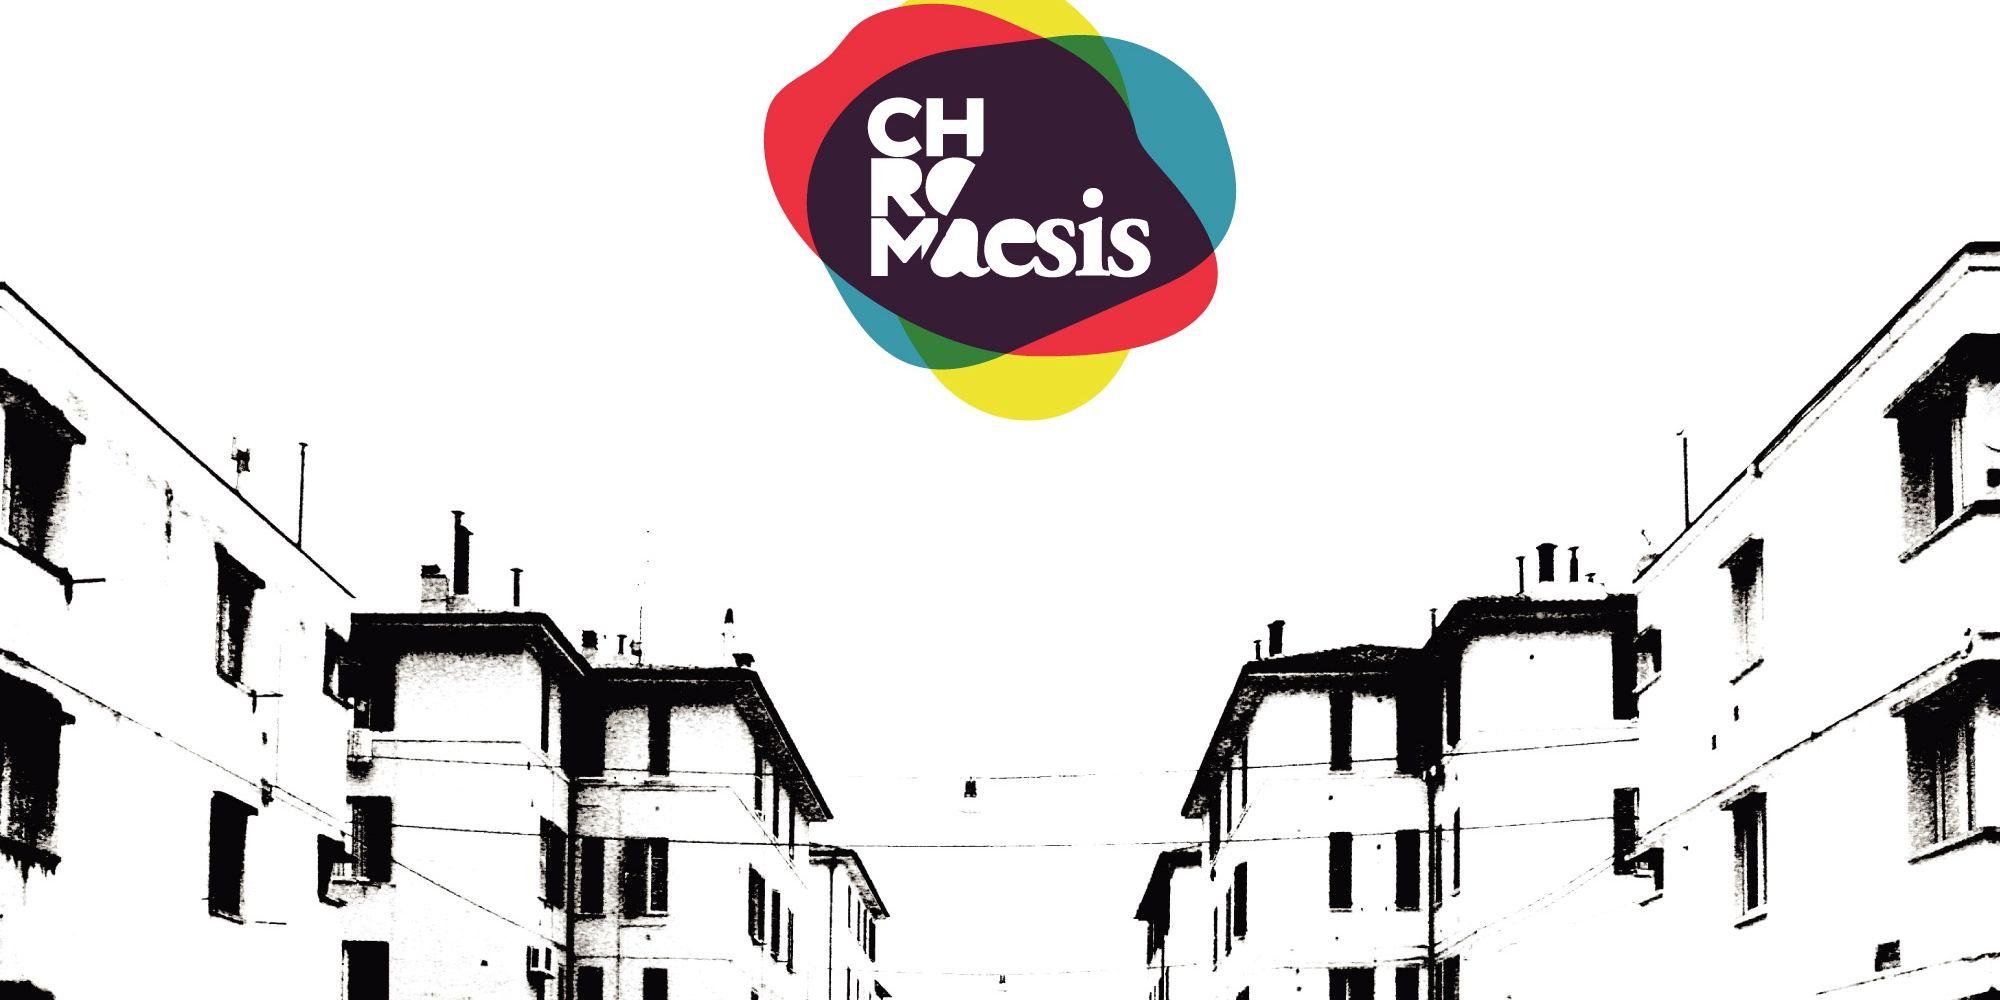 Chromaesis - Incursioni culturali nel quartiere San Giuseppe a Jesi